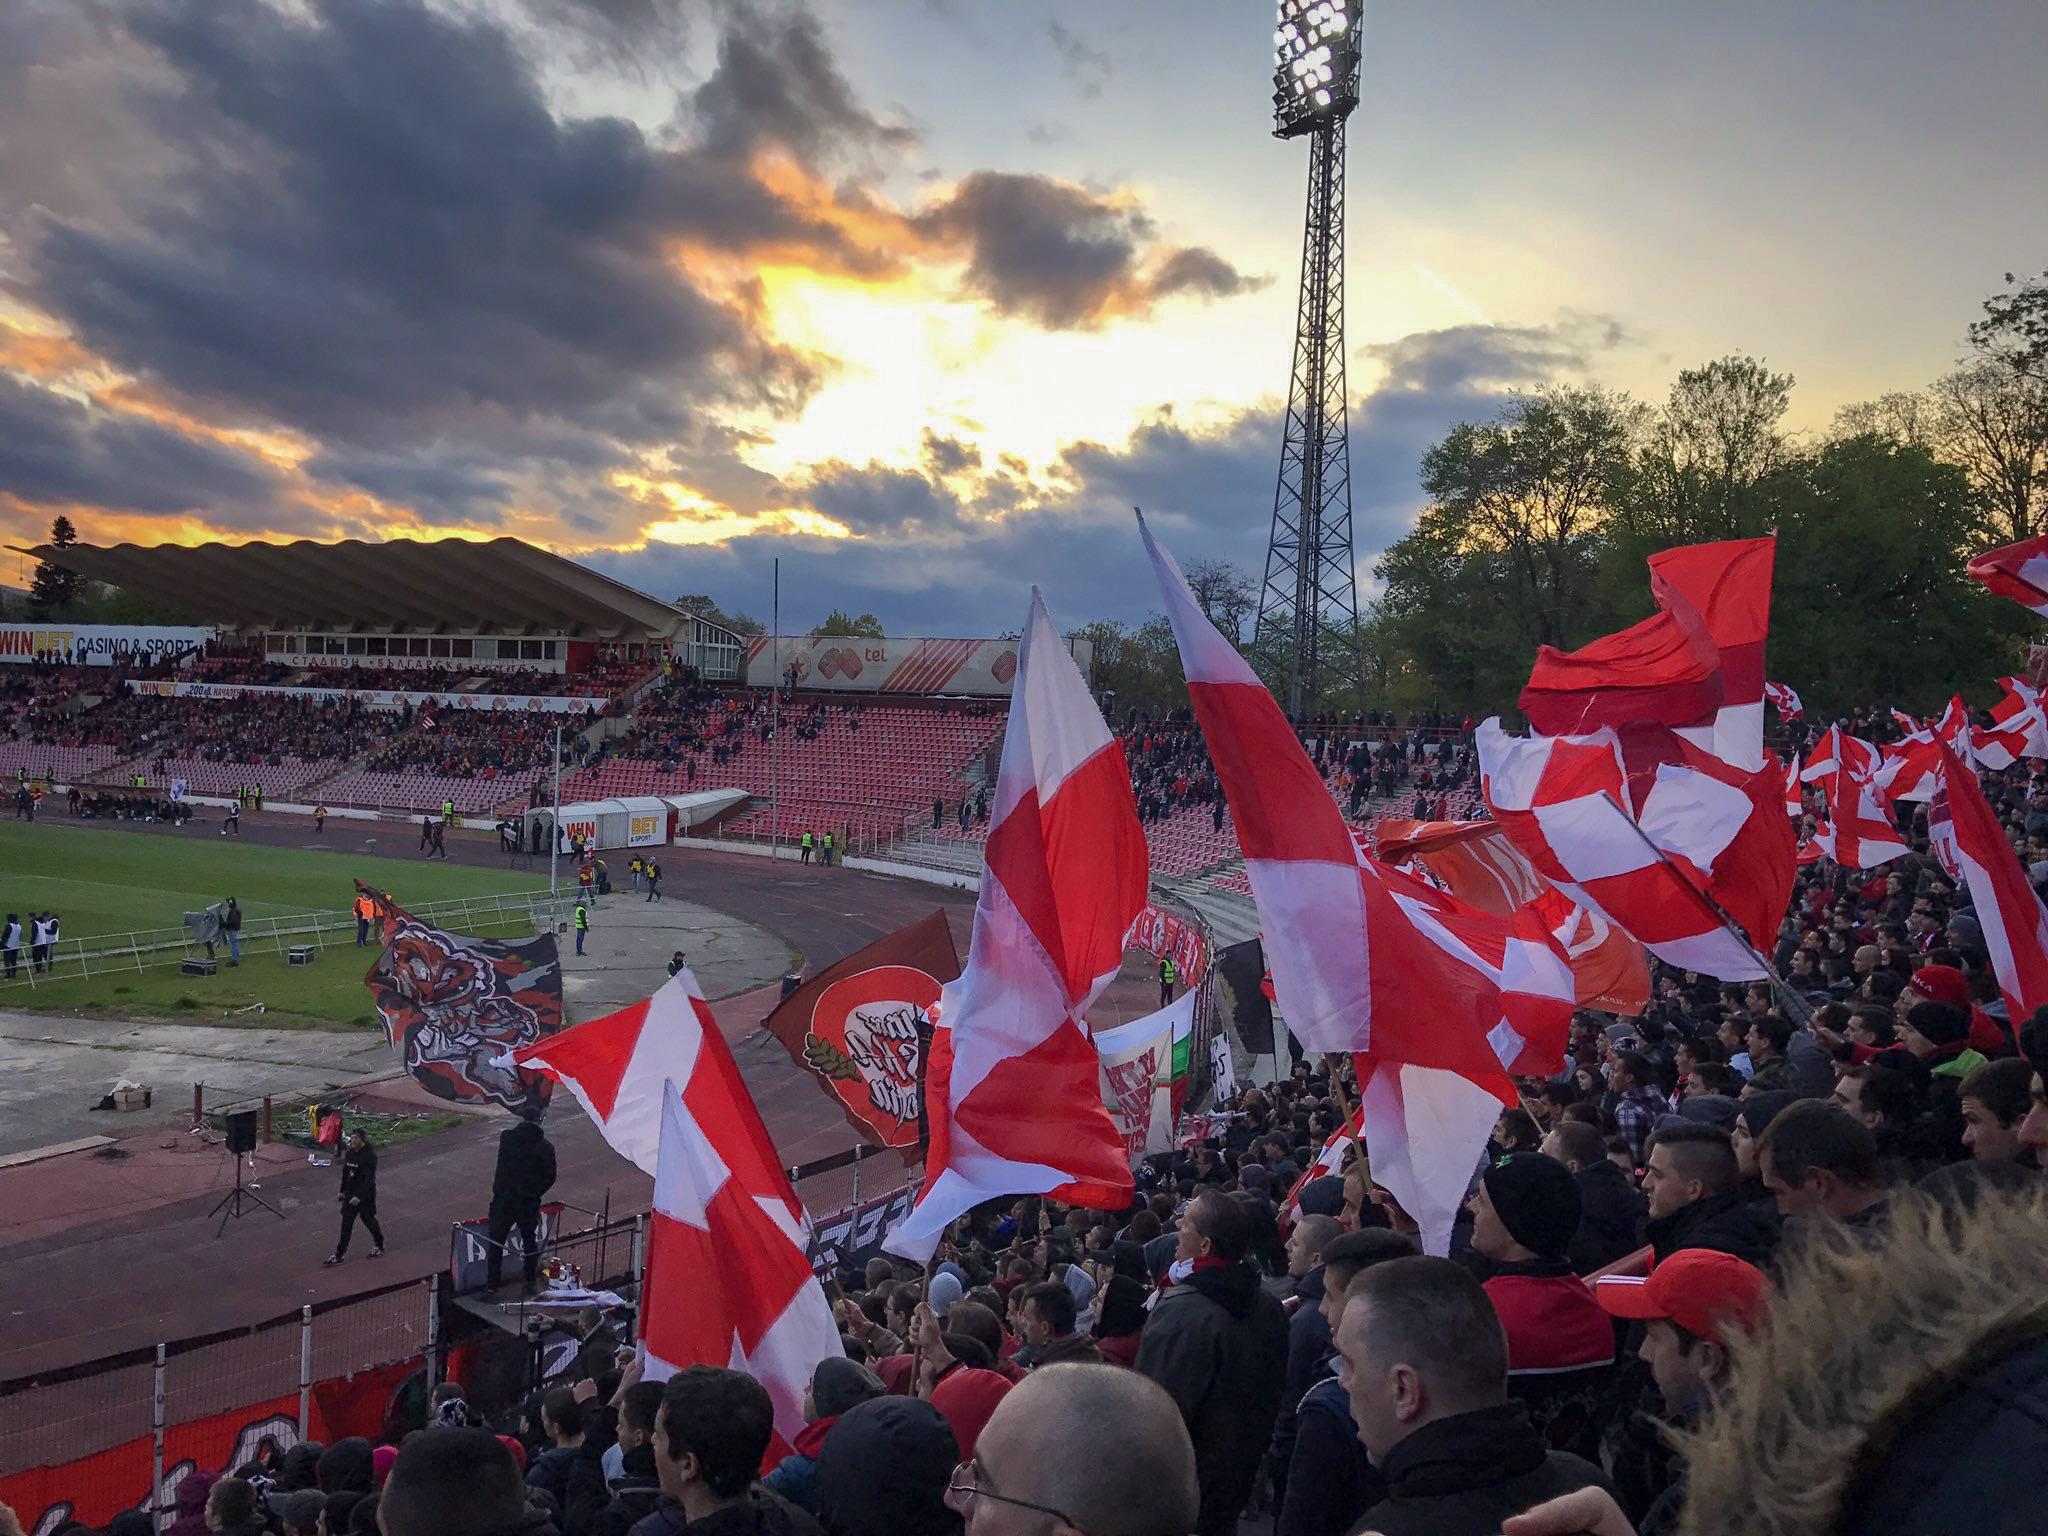 CSKA-Sofia-Fans-Bulgarian-Army-Stadium